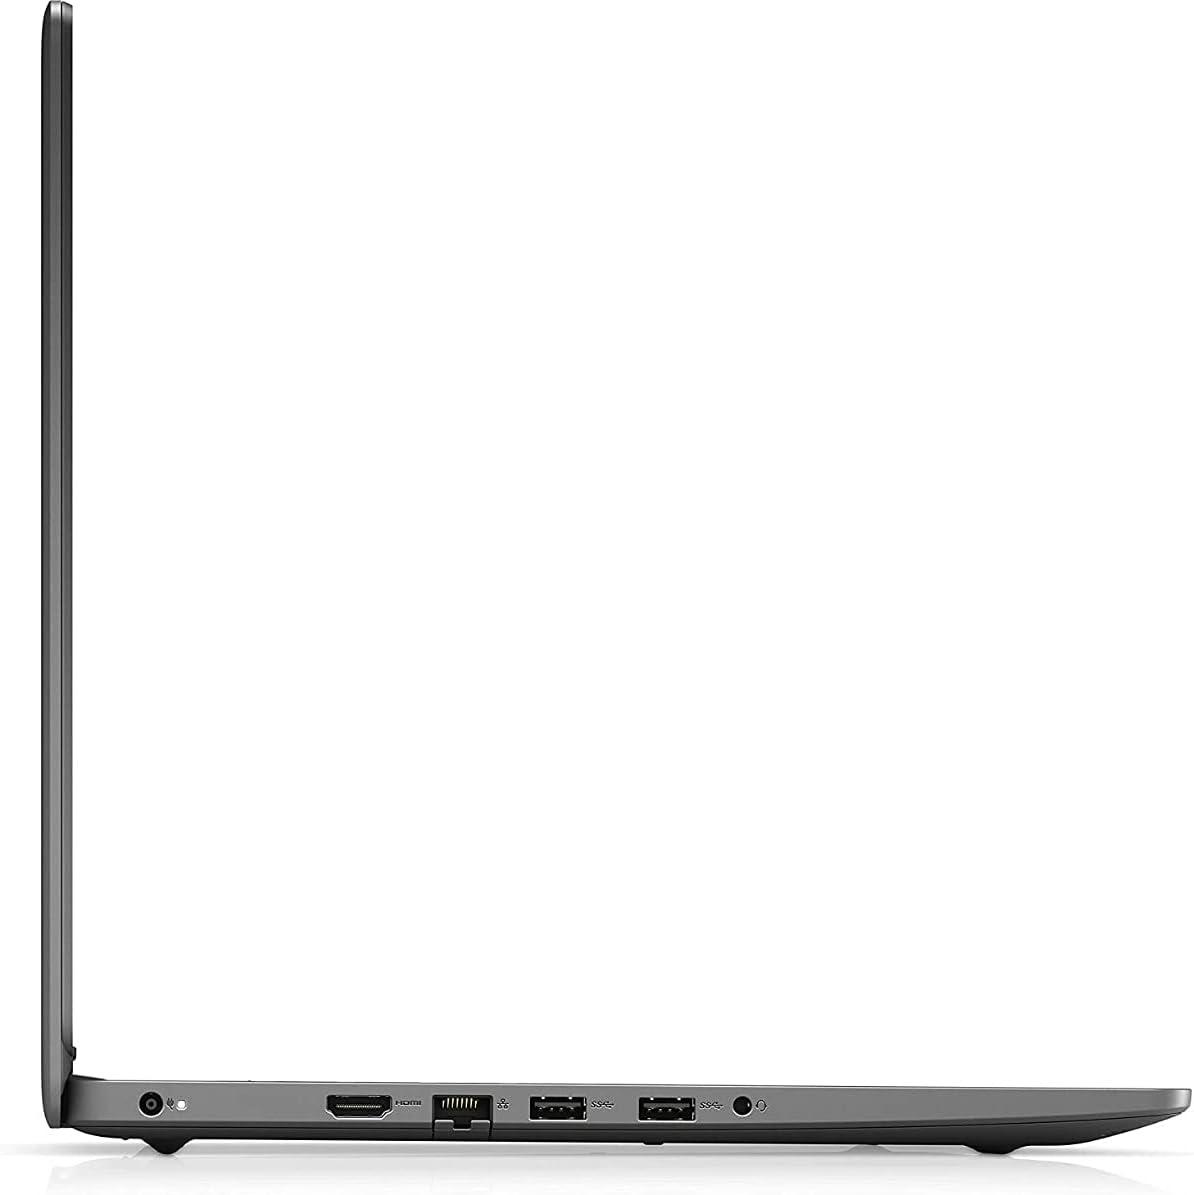 2021 Newest Dell Inspiron 3000 Business Laptop, 15.6 HD LED-Backlit Display, Intel Celeron Processor N4020, 16GB DDR4 RAM, 1TB Hard Disk Drive, Online Meeting Ready, Webcam, HDMI, Win10 Pro, Black